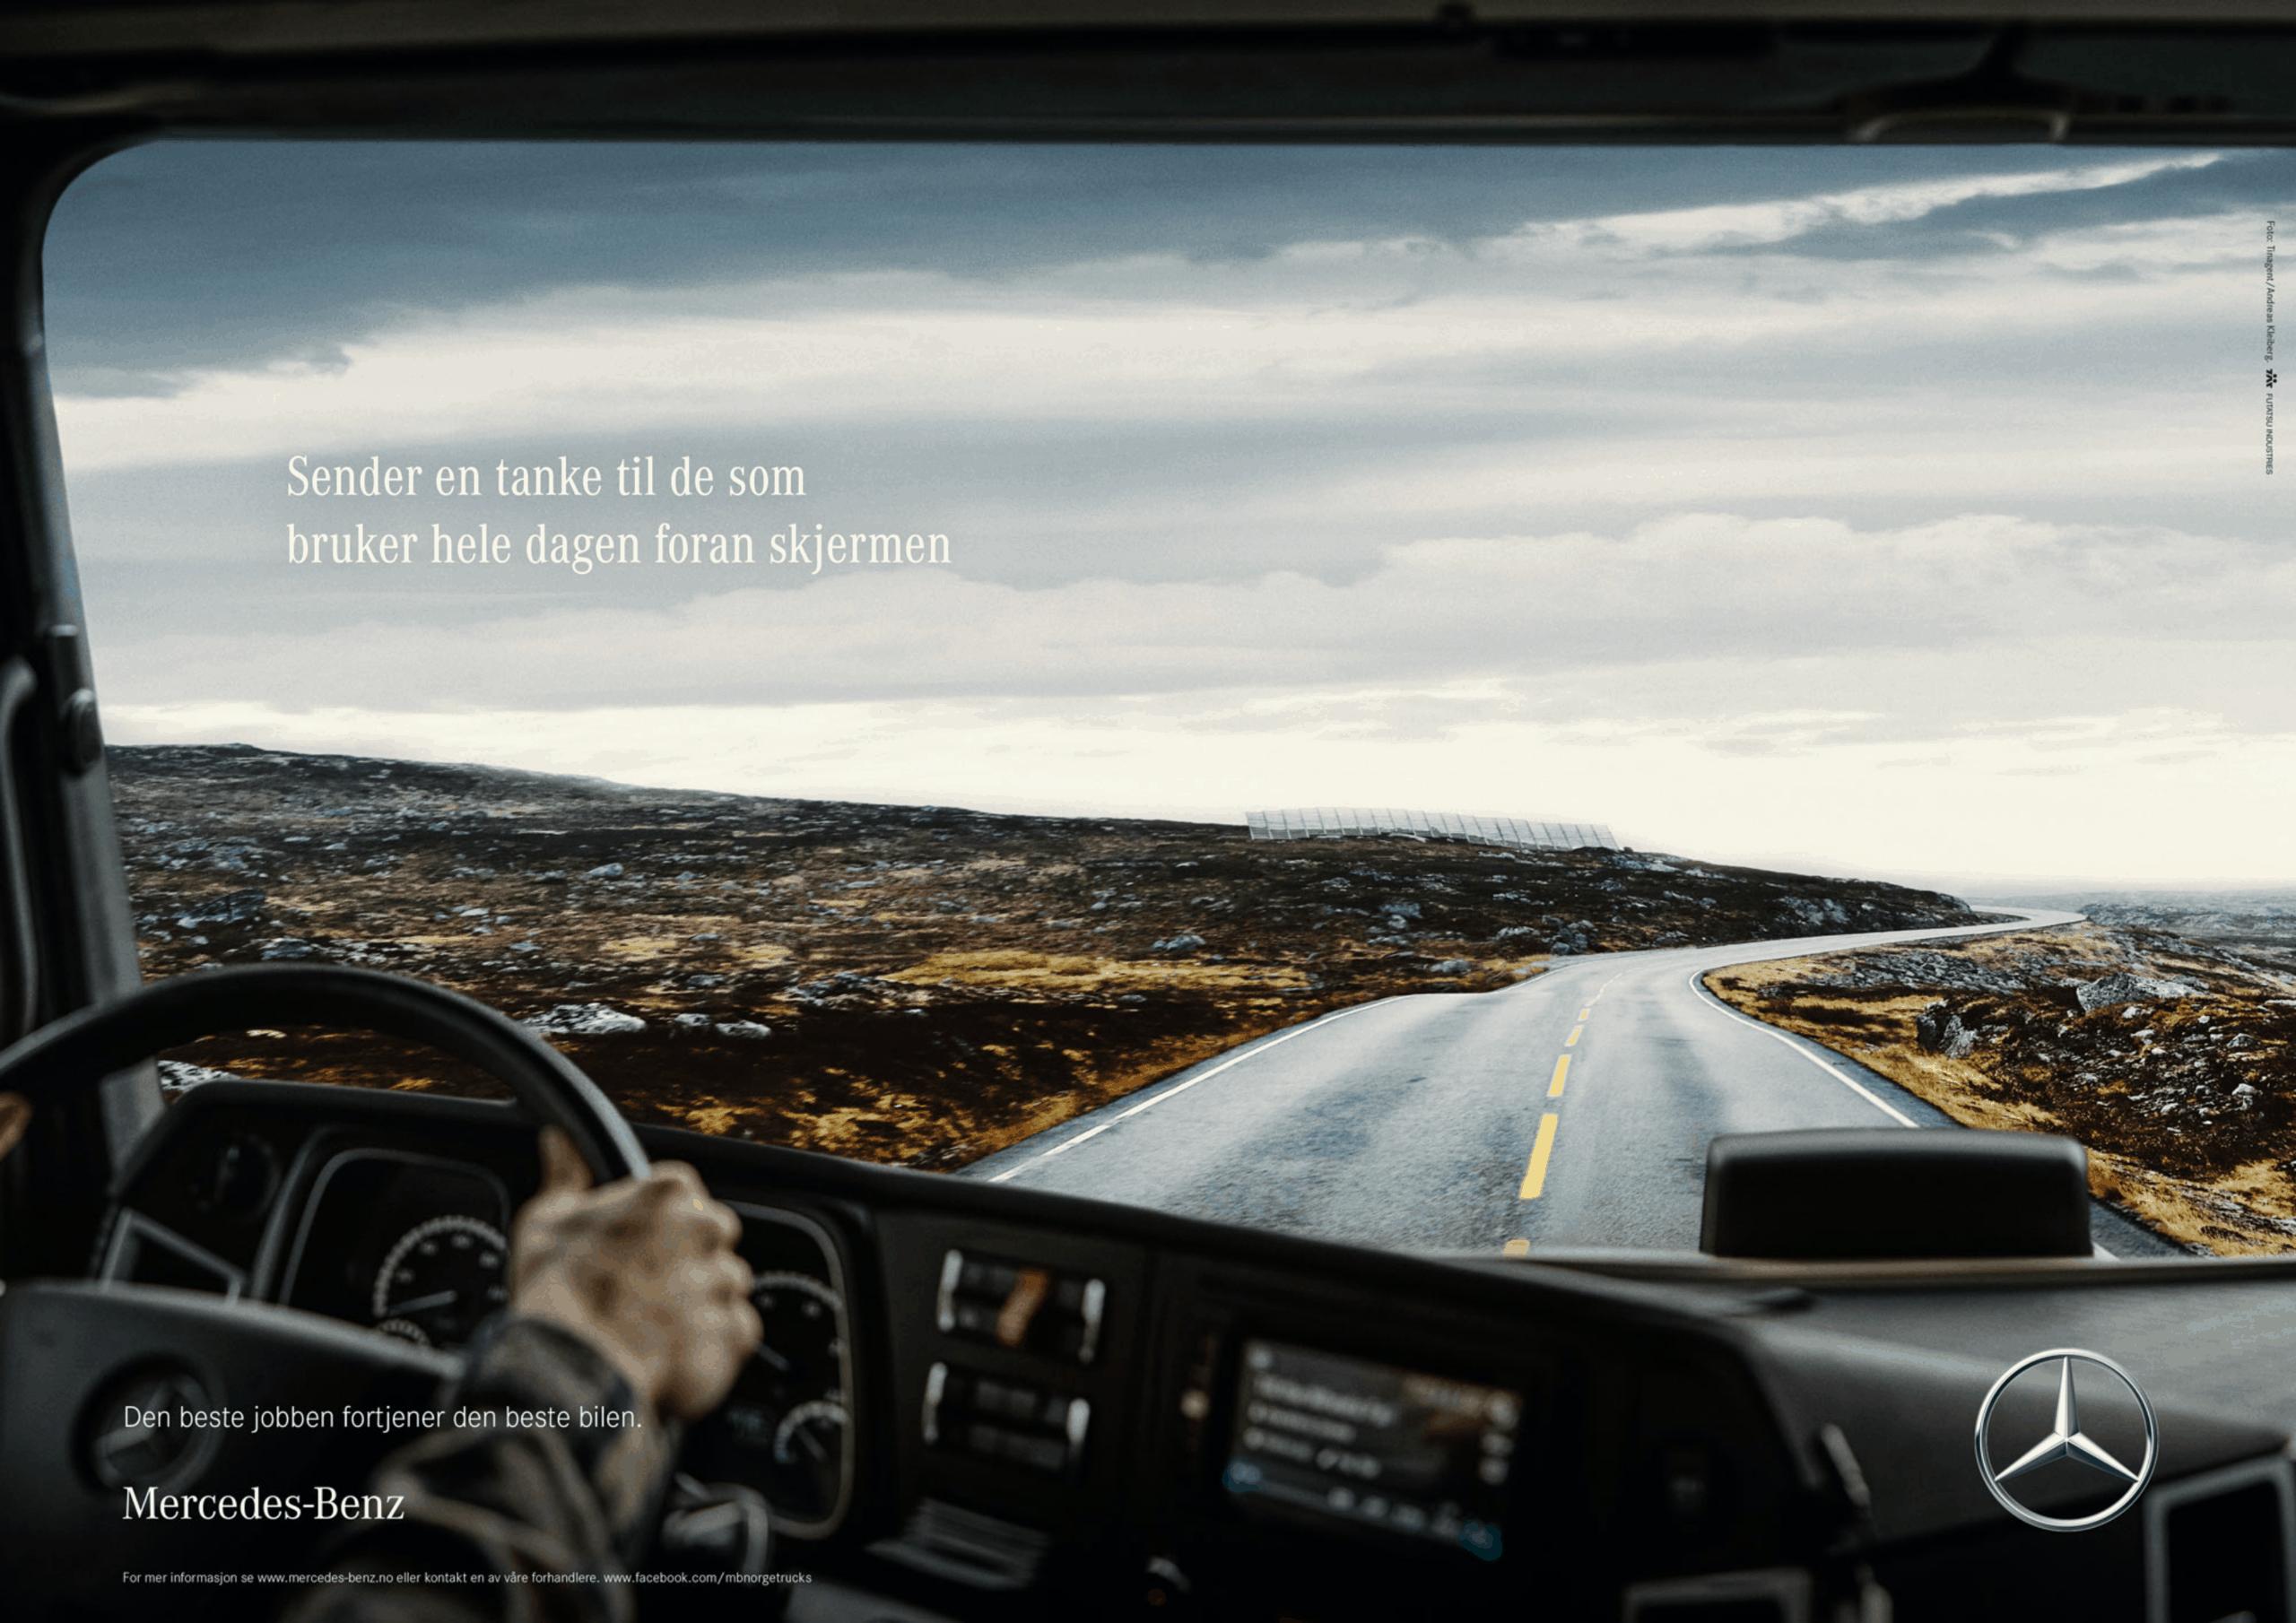 Mercedes-Benz trucks print advertisement